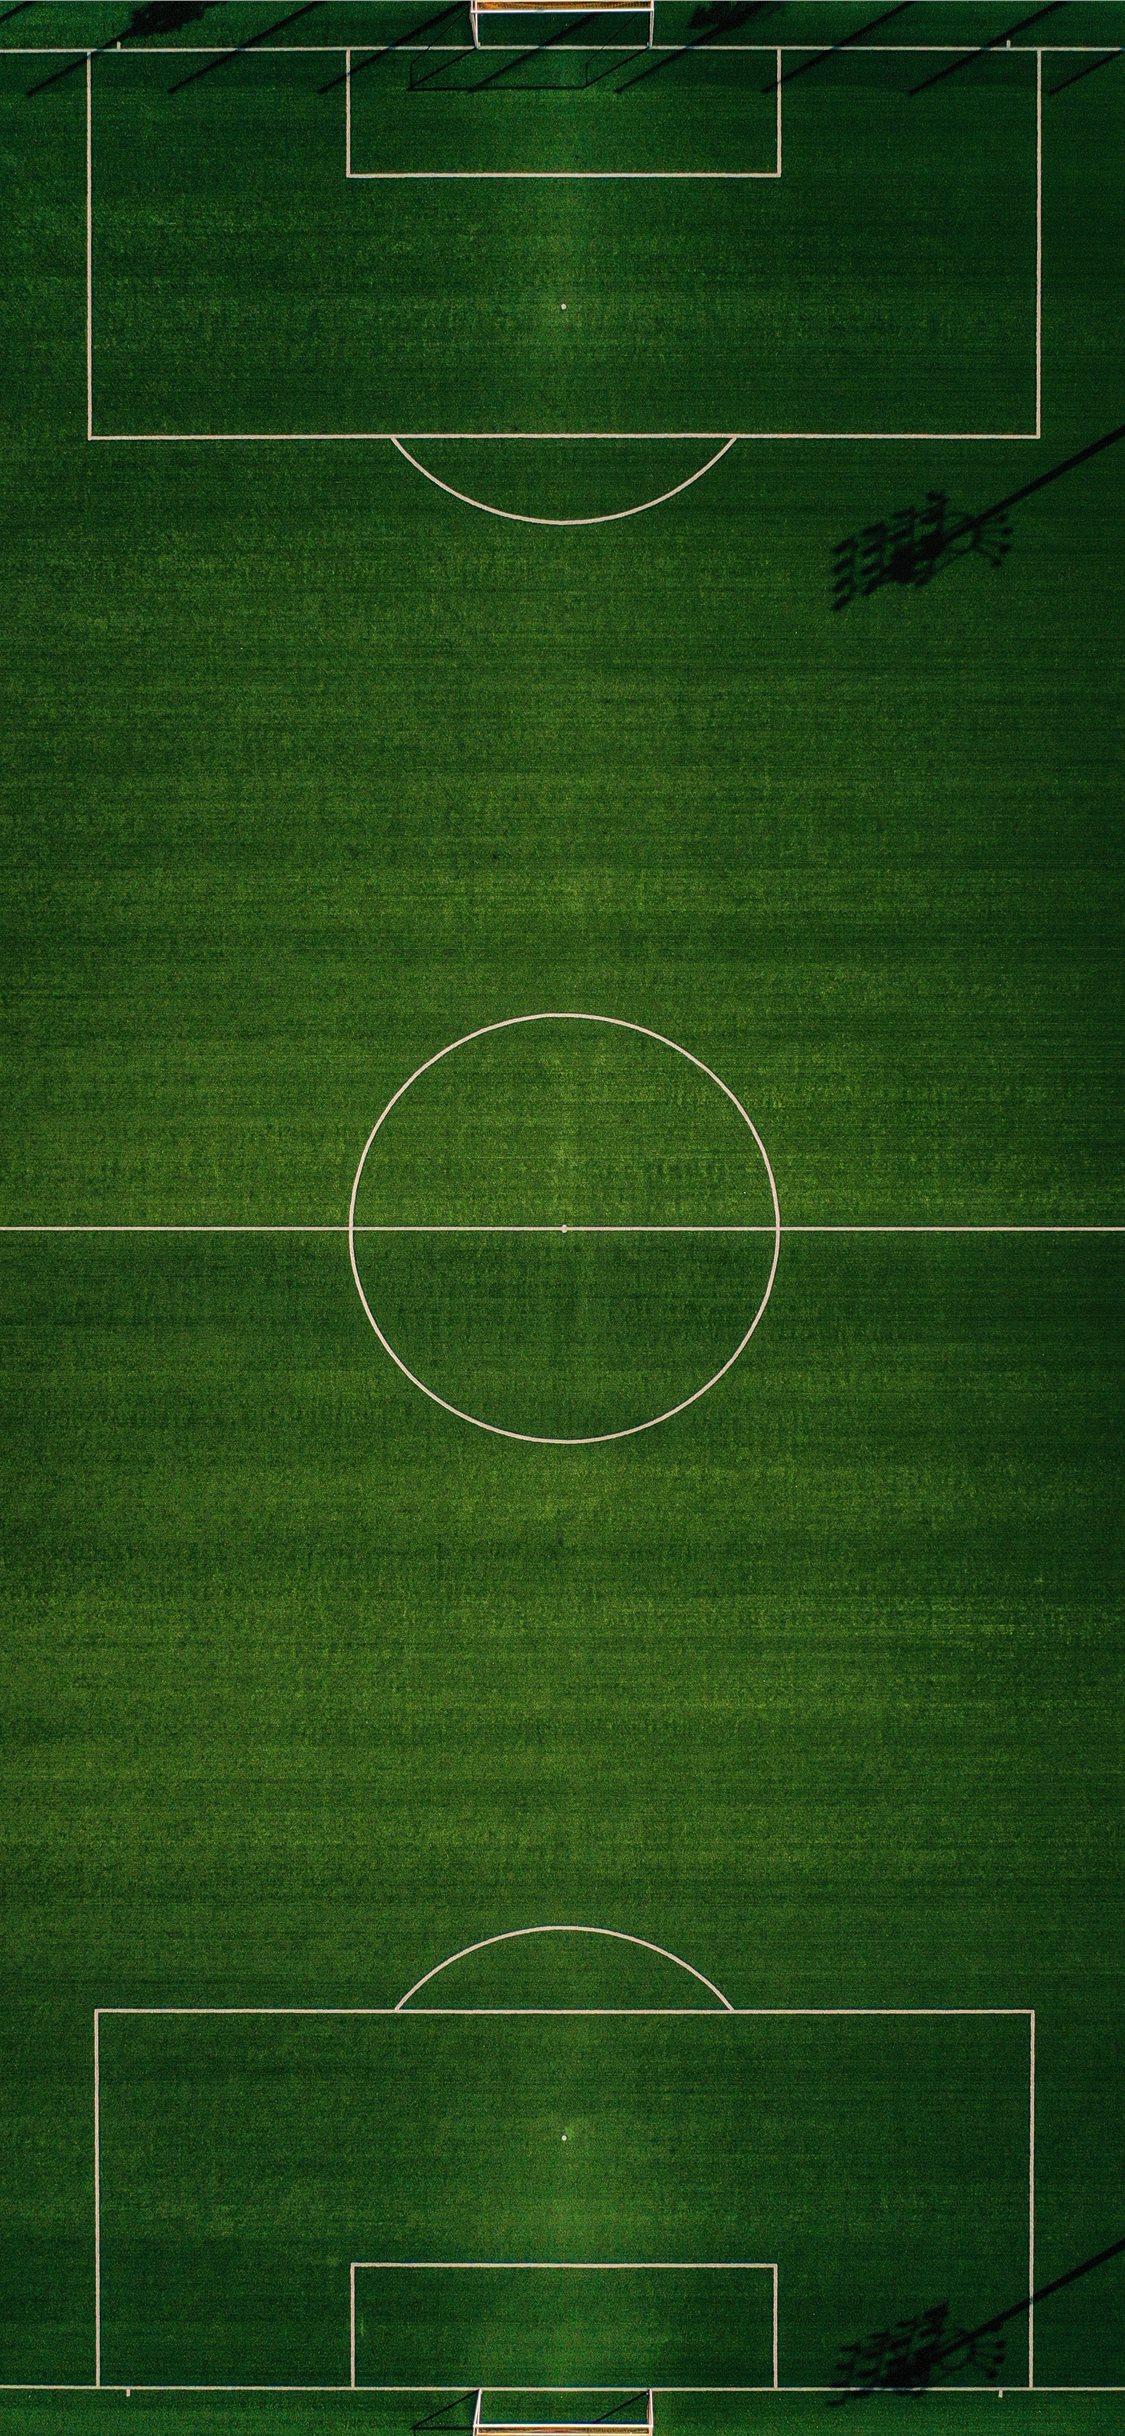 Best Football Iphone X Wallpapers Hd Ilikewallpaper